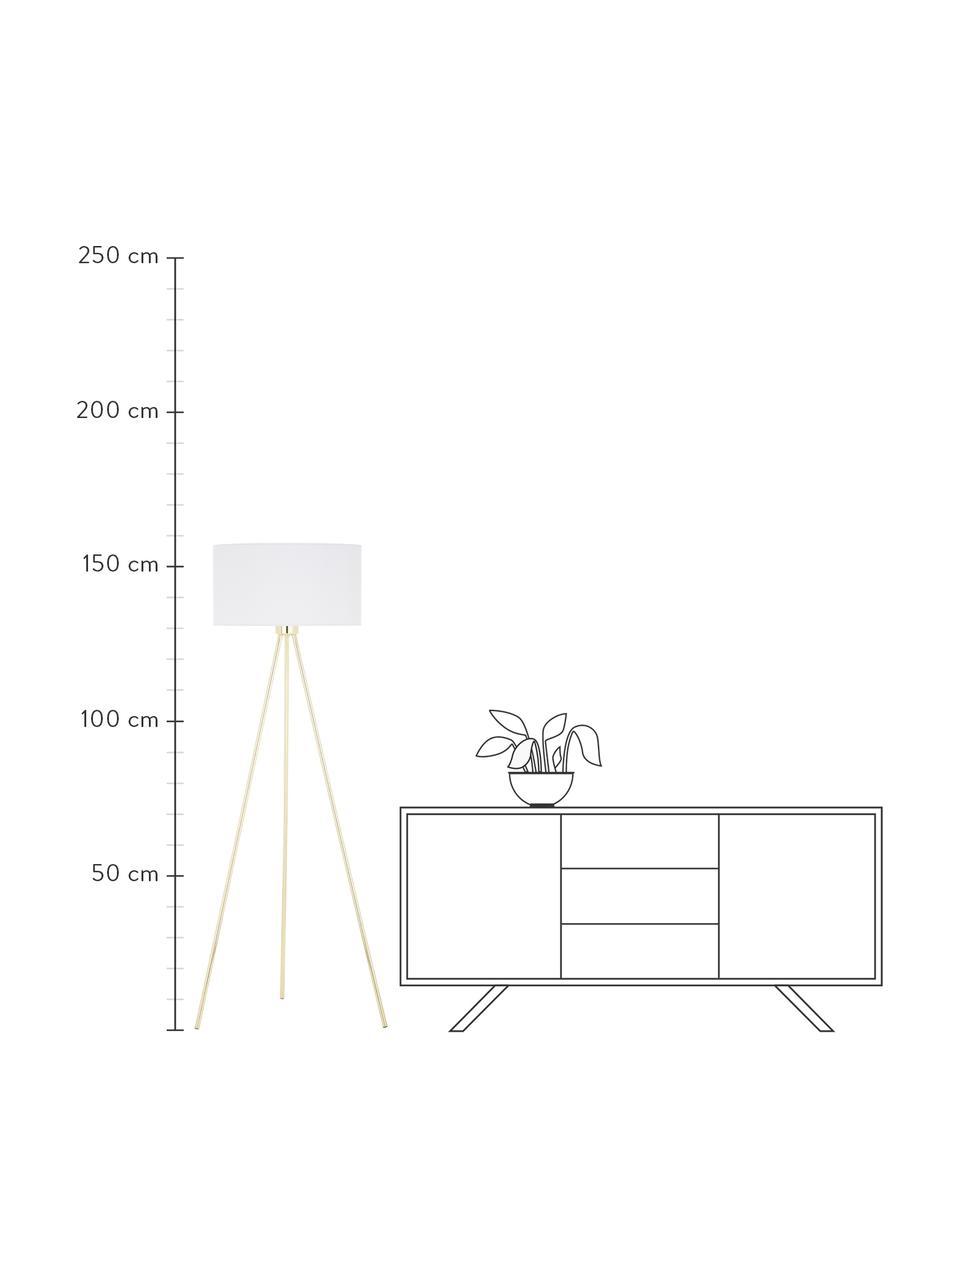 Driepoot vloerlamp Cella met stoffen kap, Lampenkap: katoenmix, Lampvoet: metaal, Lampvoet: glanzend goudkleurig. Lampenkap: wit, Ø 48 x H 158 cm